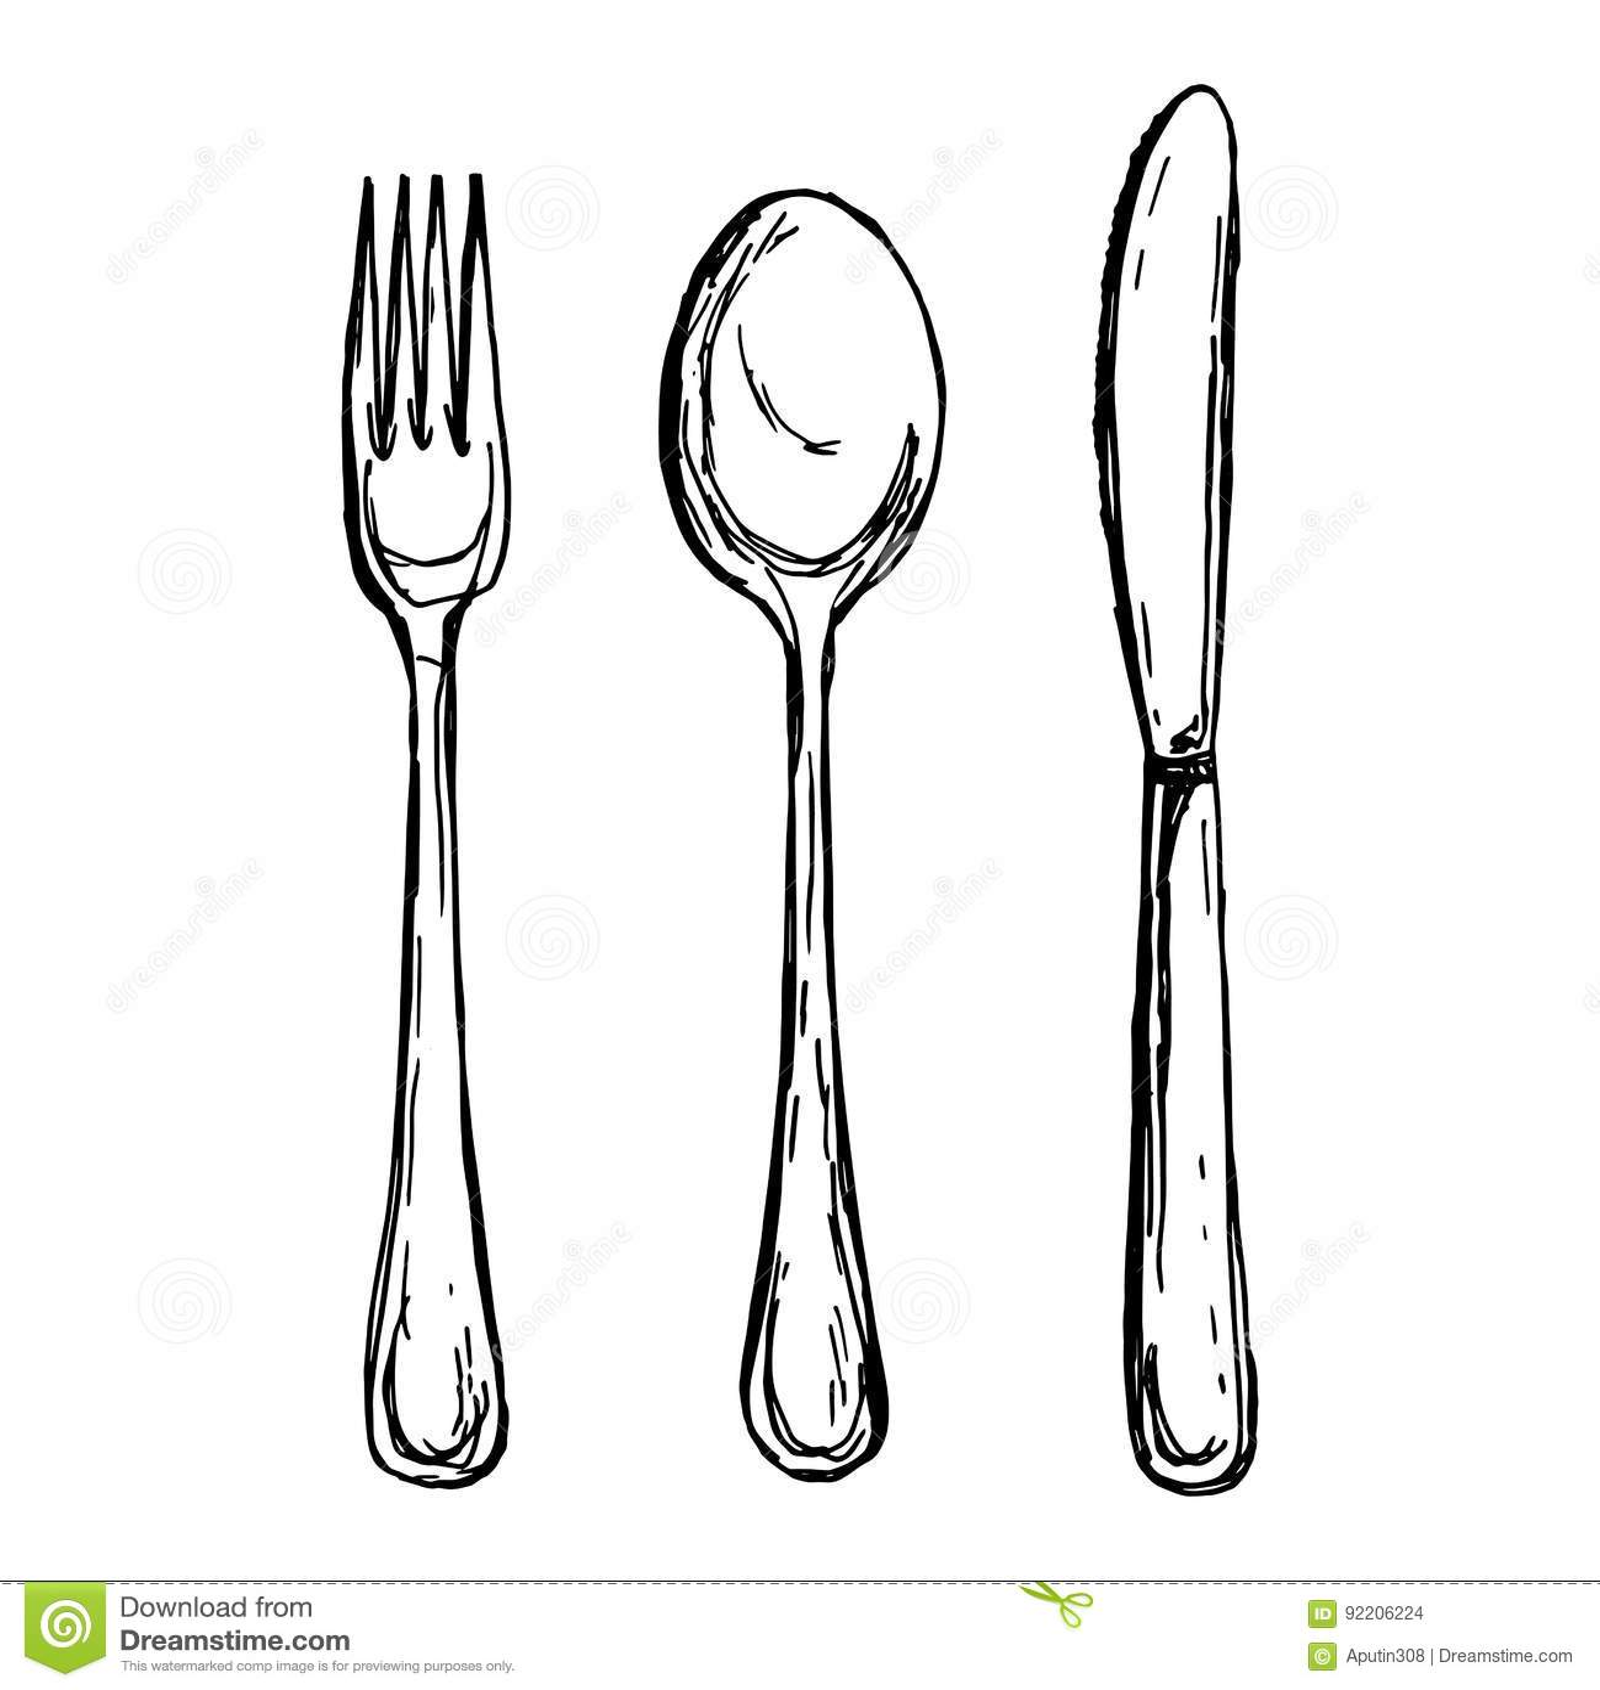 Spoon Fork And Knife Sketch Vector Illustration